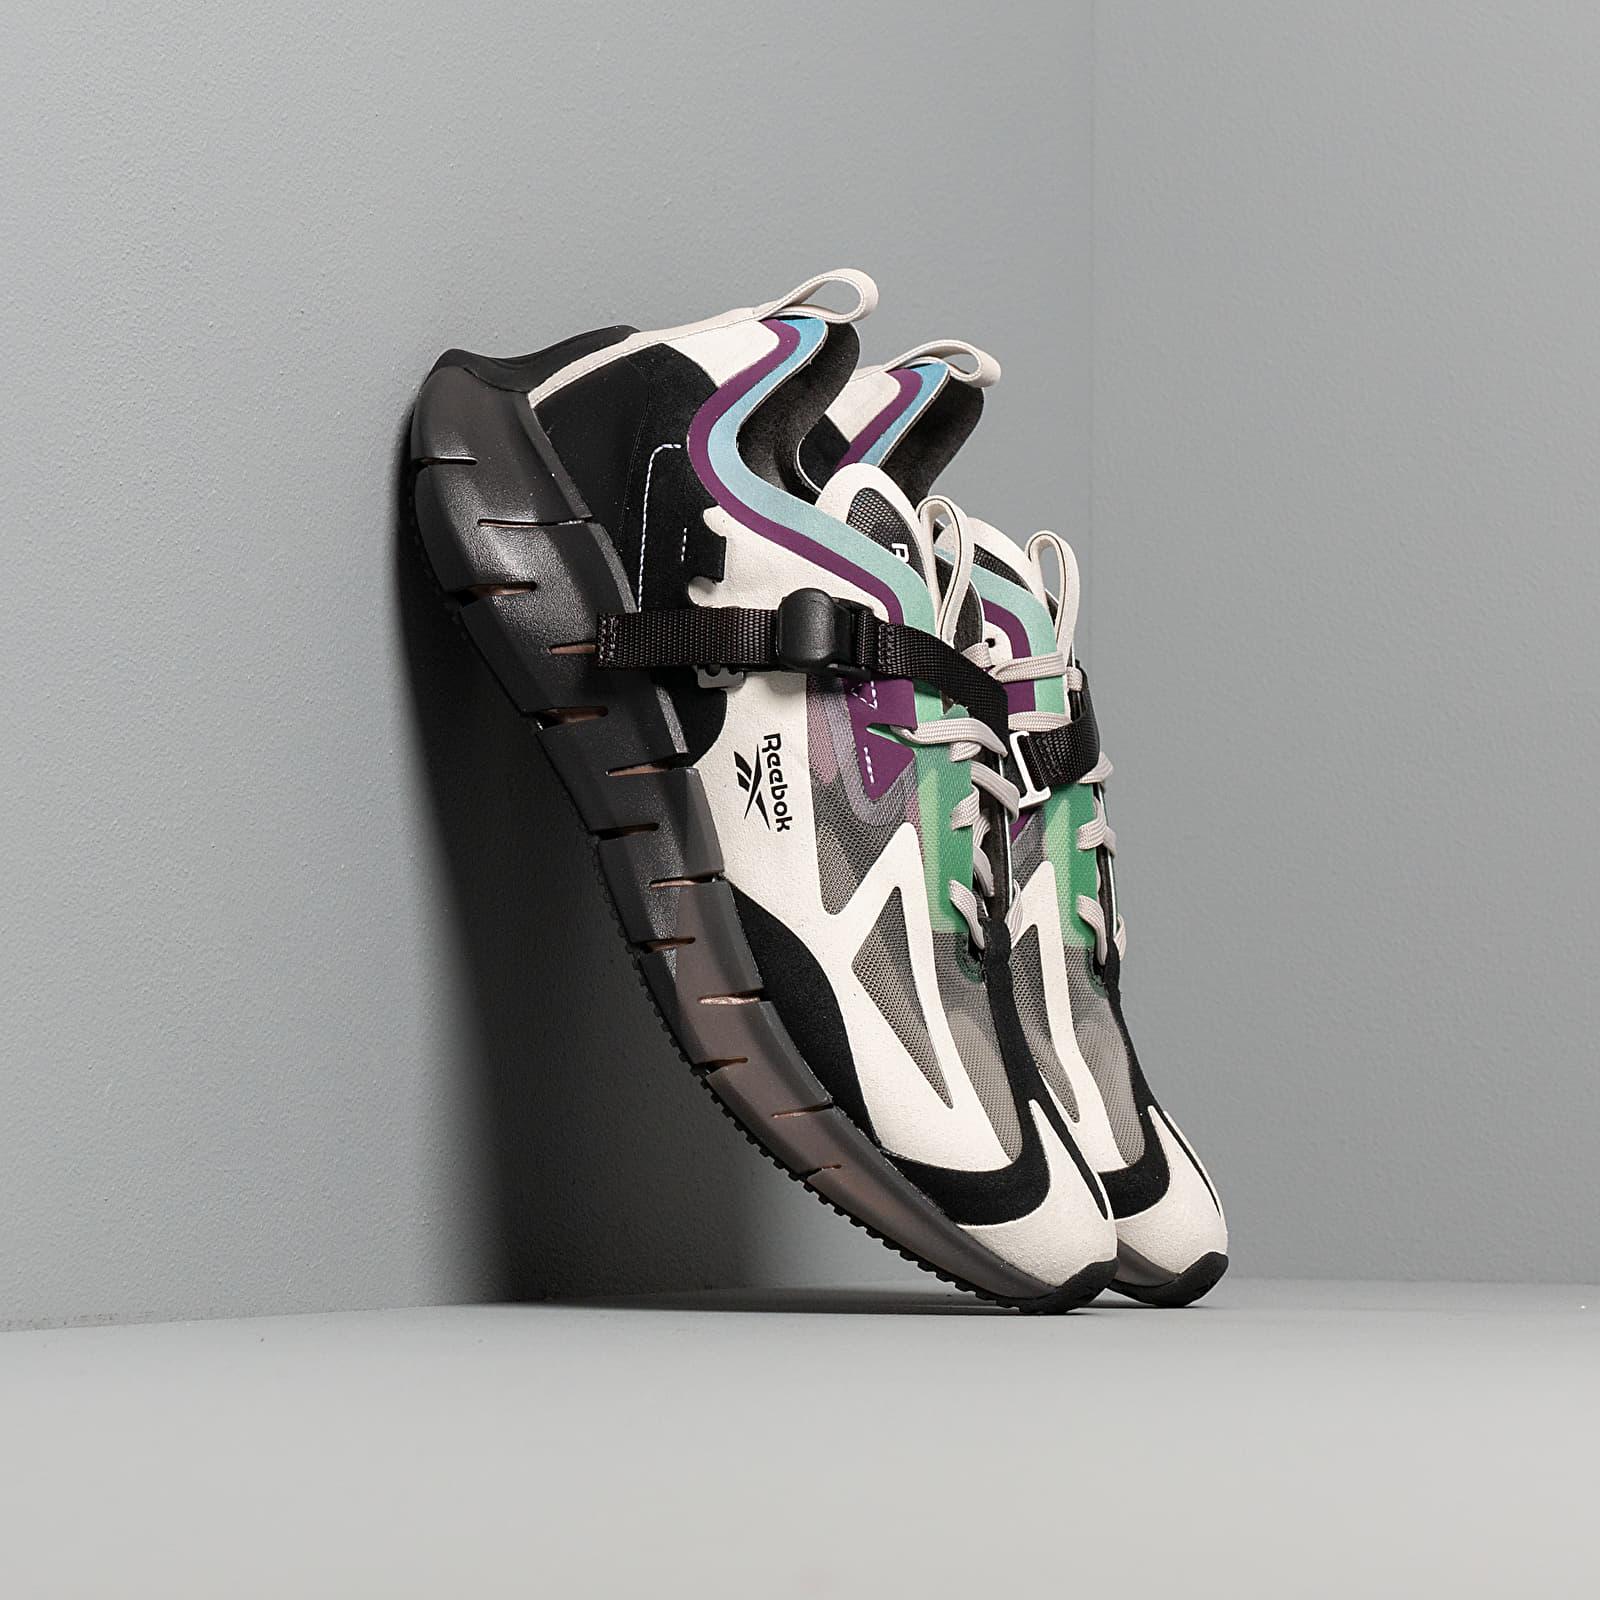 Zapatillas Hombre Reebok Zig Kinetica Concept_Type1 Sand Stone/ Black/ Emerald